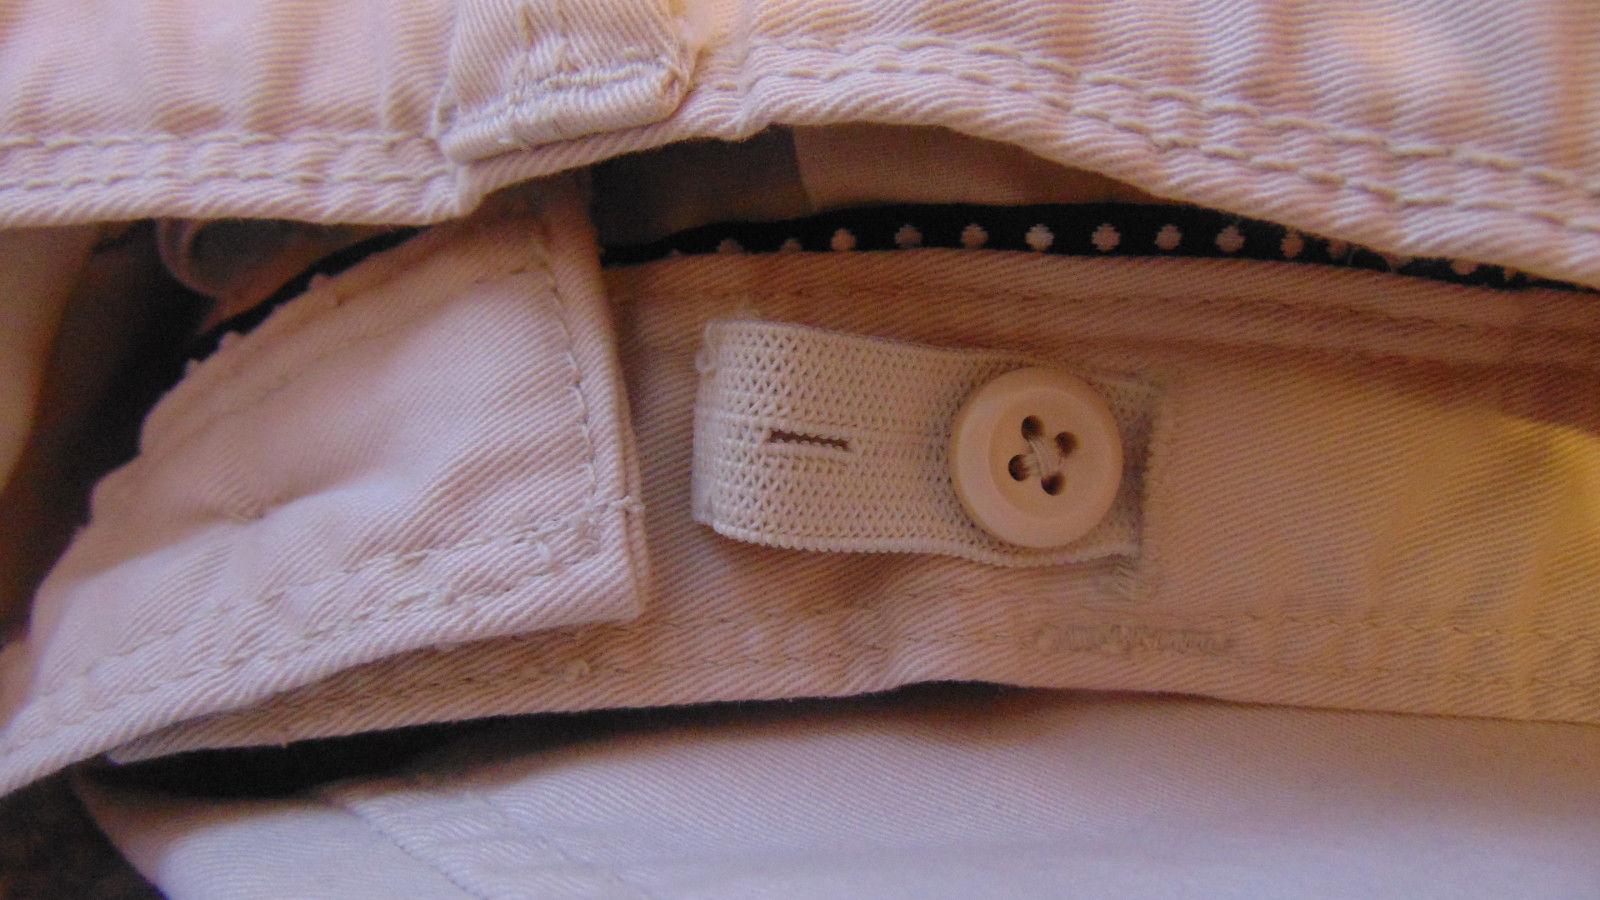 Gap Kids Size 14 Khaki Pants Adjustable Waist 4 Pockets-Belt Loops-T-Shirt-